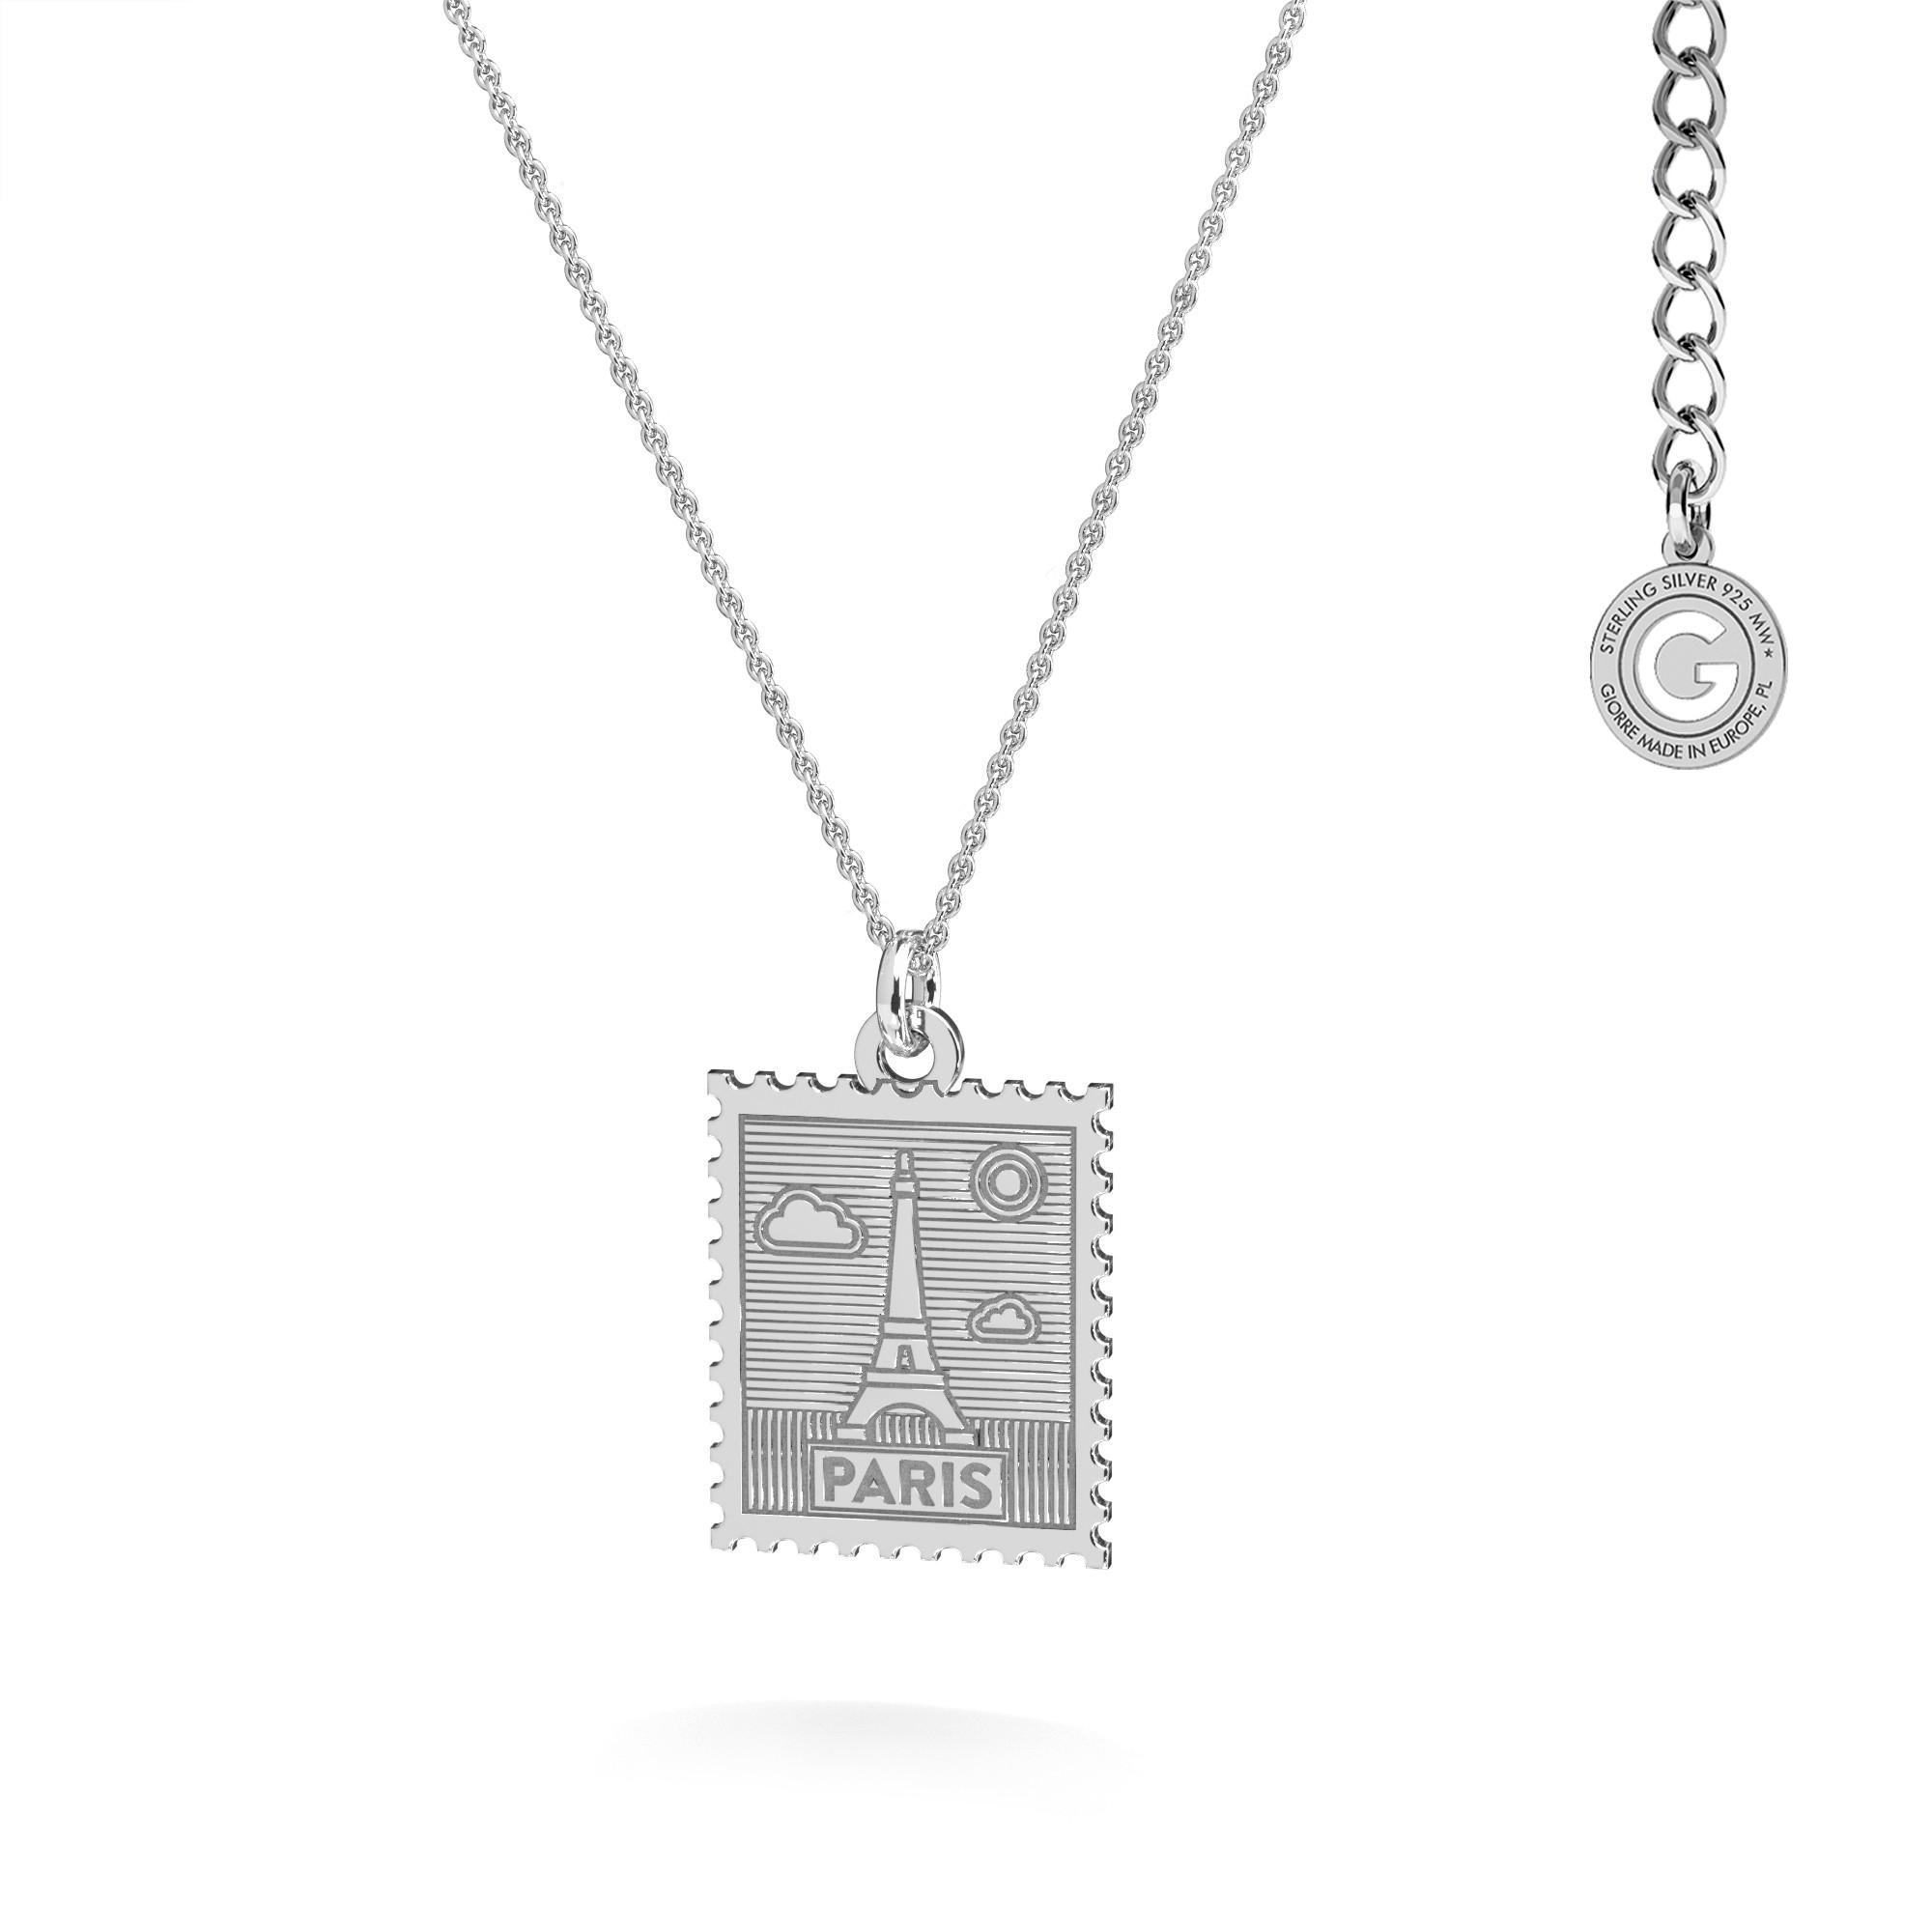 Warsaw postage stamp necklace sterling silver 925